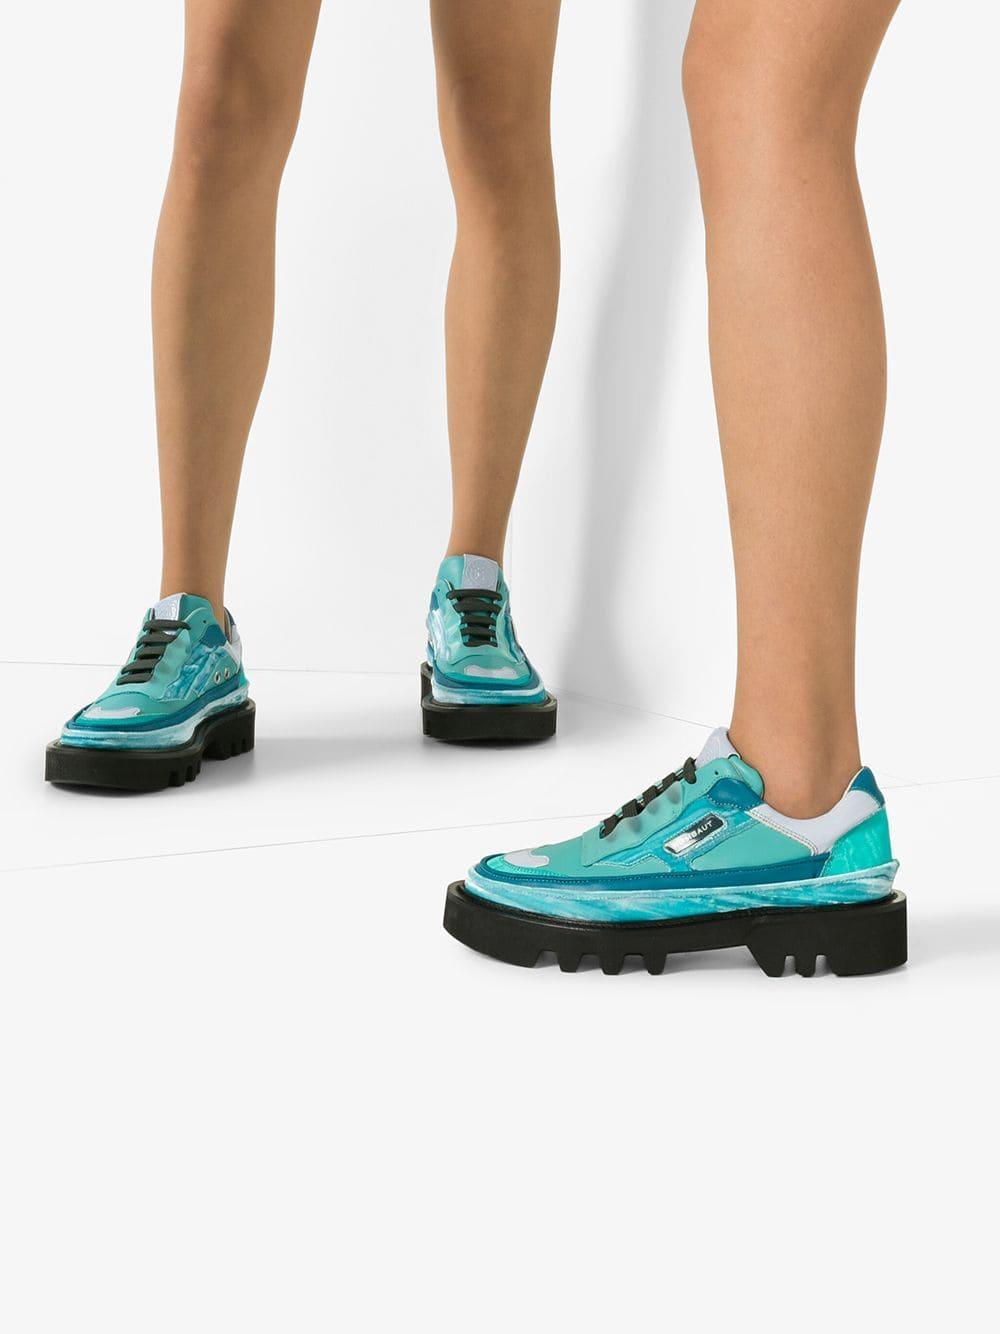 Zapatillas Protect Hybrid Rombaut de color Azul